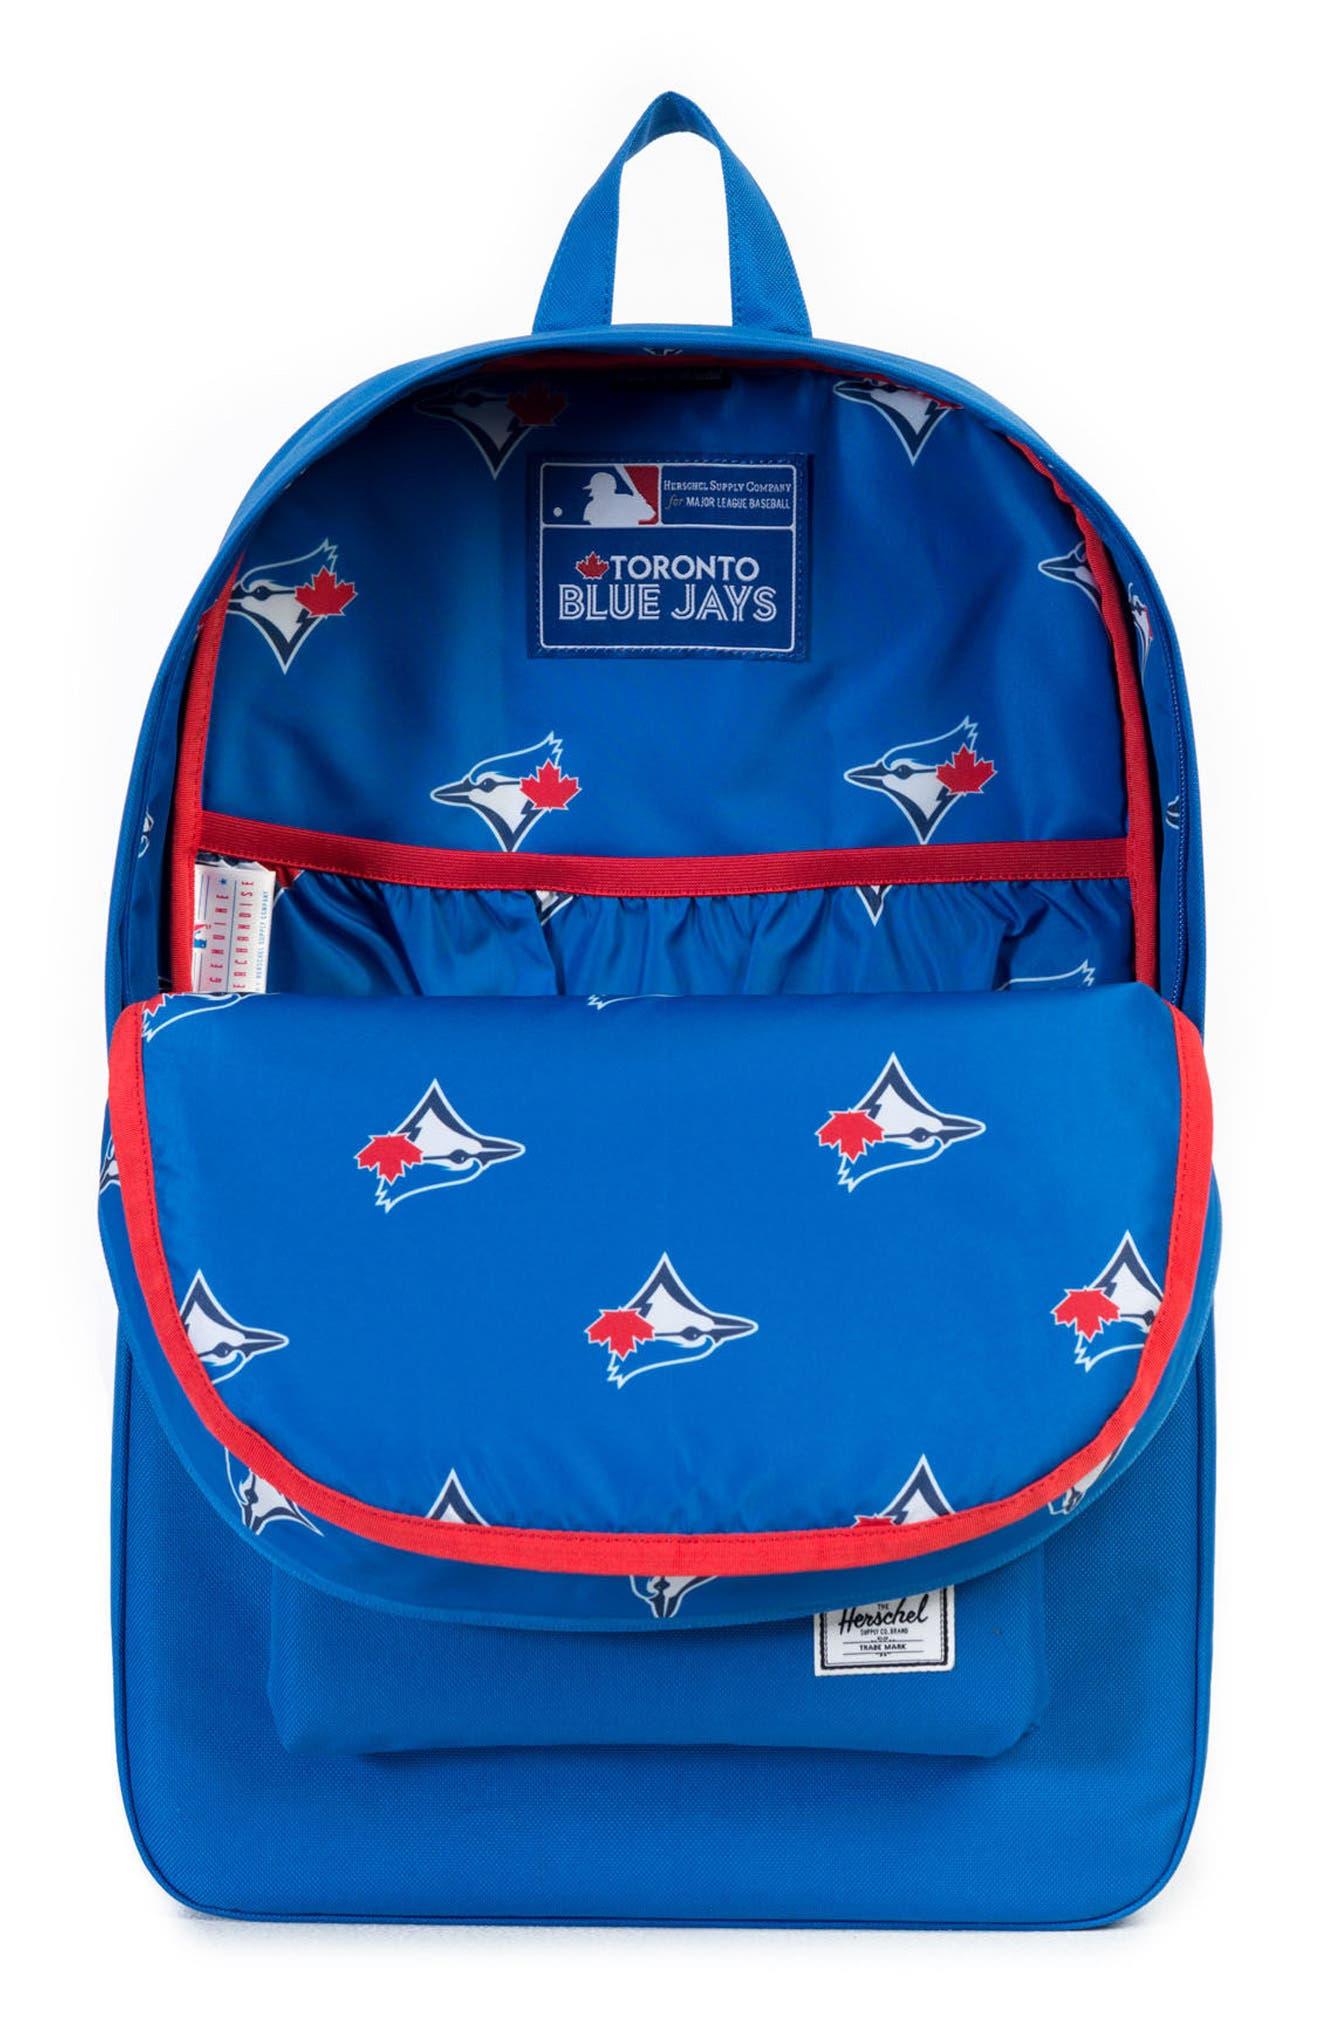 Heritage Toronto Blue Jays Backpack,                             Alternate thumbnail 3, color,                             Toronto Blue Jays